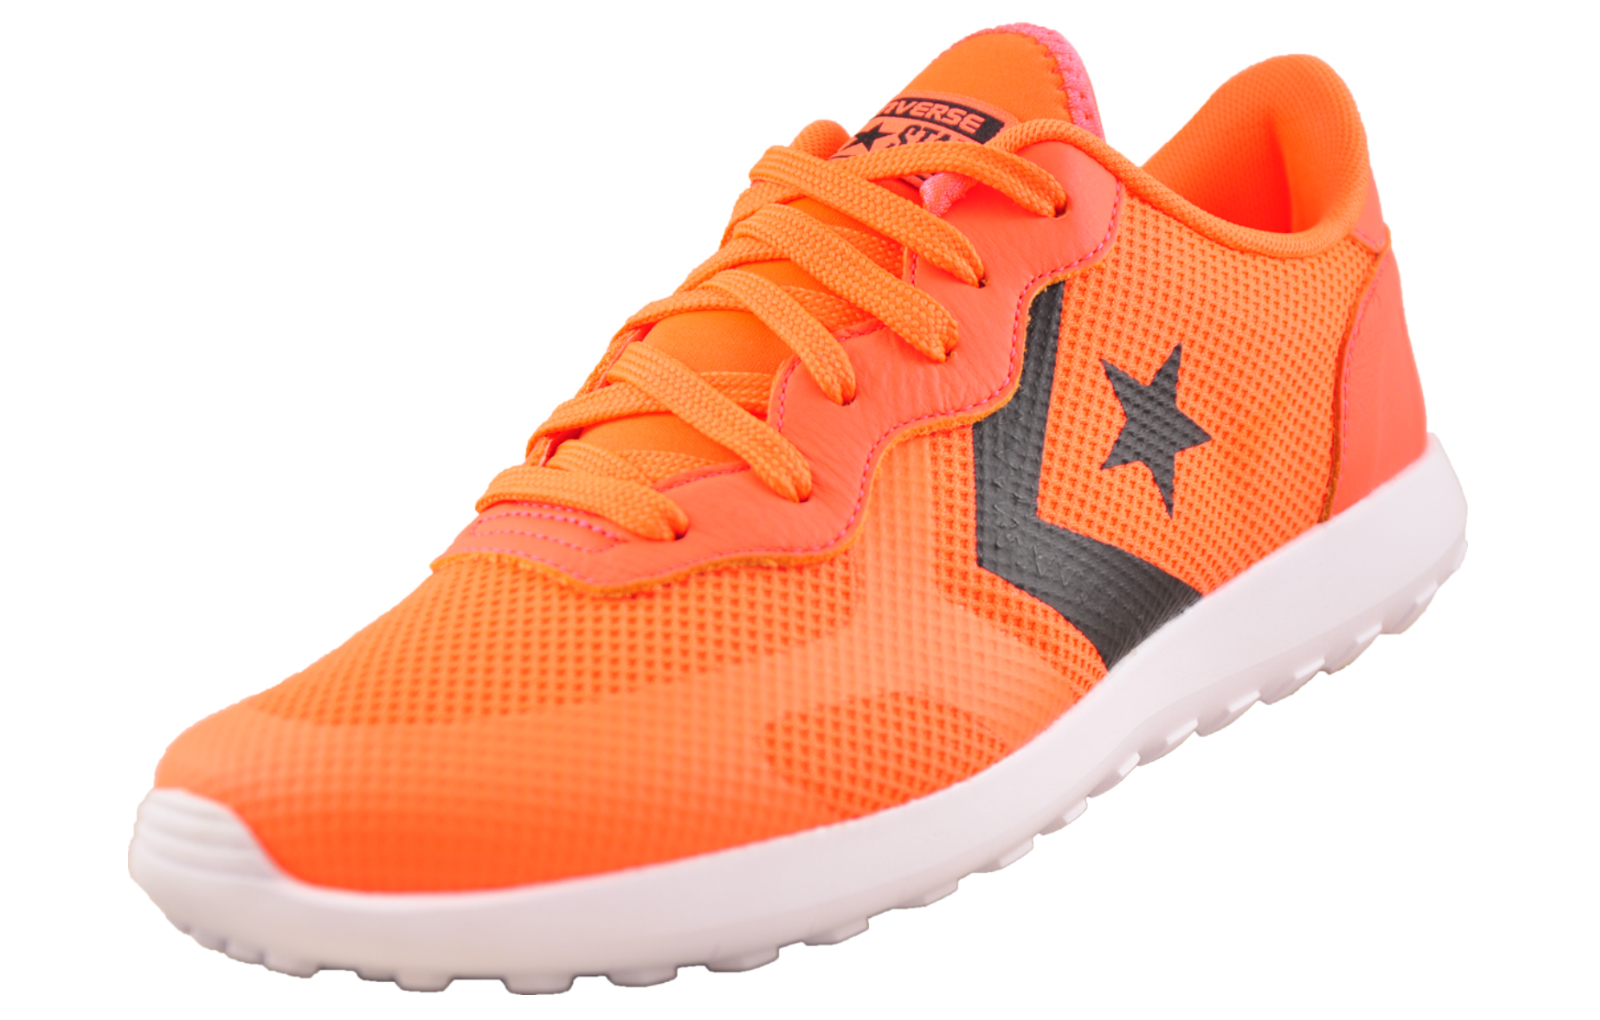 c7f7332802 Converse Thunderbolt Ultra Ox Uni. Hyper Orange / Black / White. Converse  Thunderbolt Ultra Ox ...